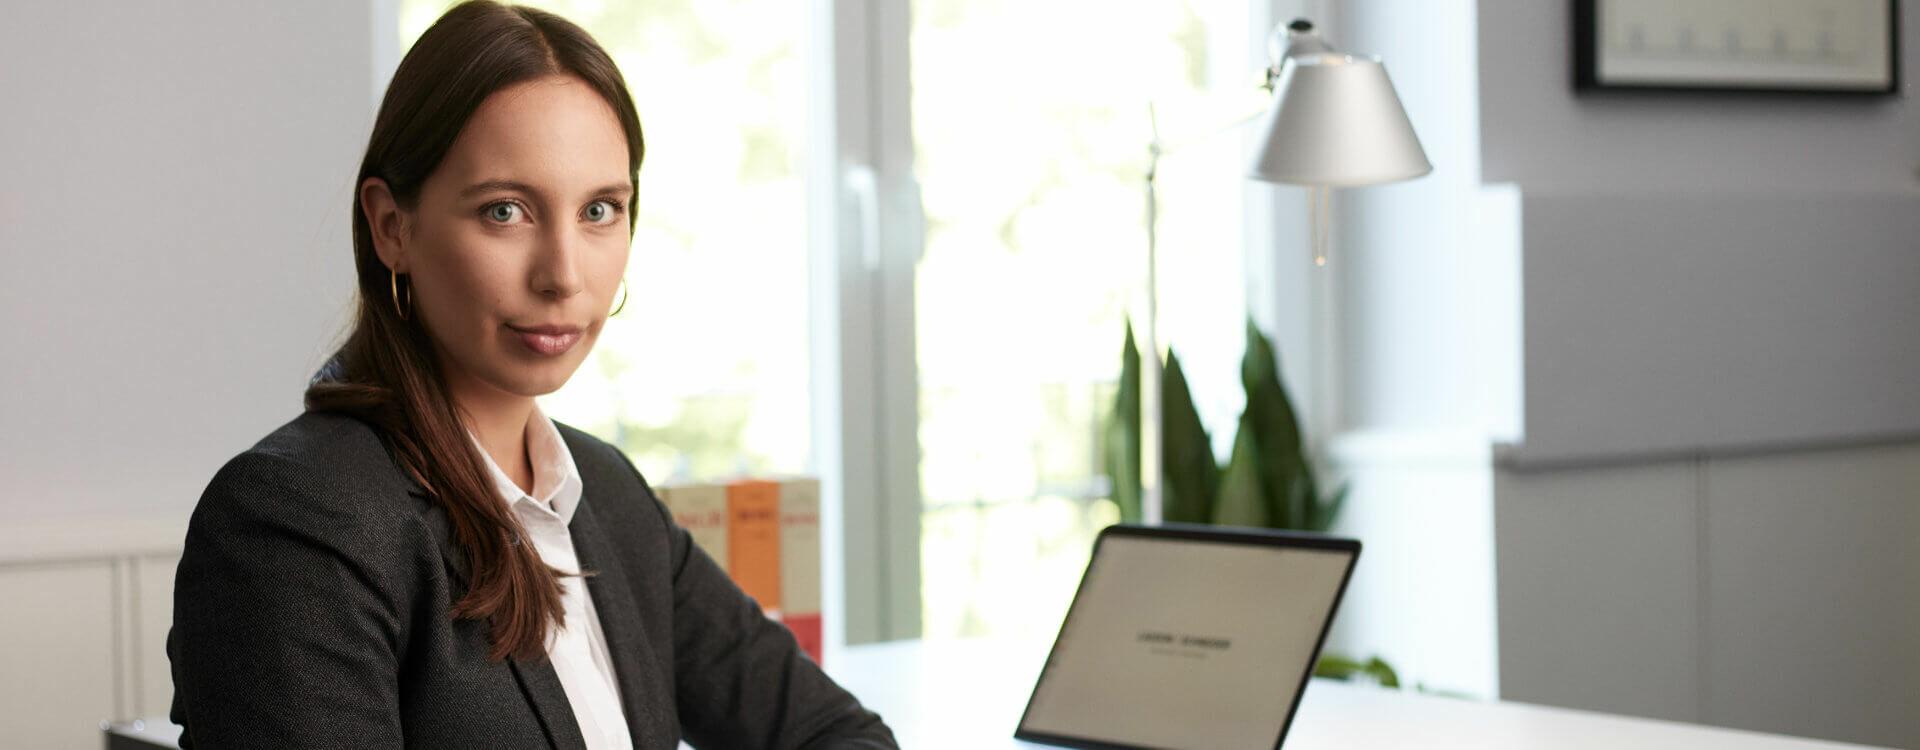 Strafverteidigerin Hamburg: Rechtsanwältin Laura Leweke